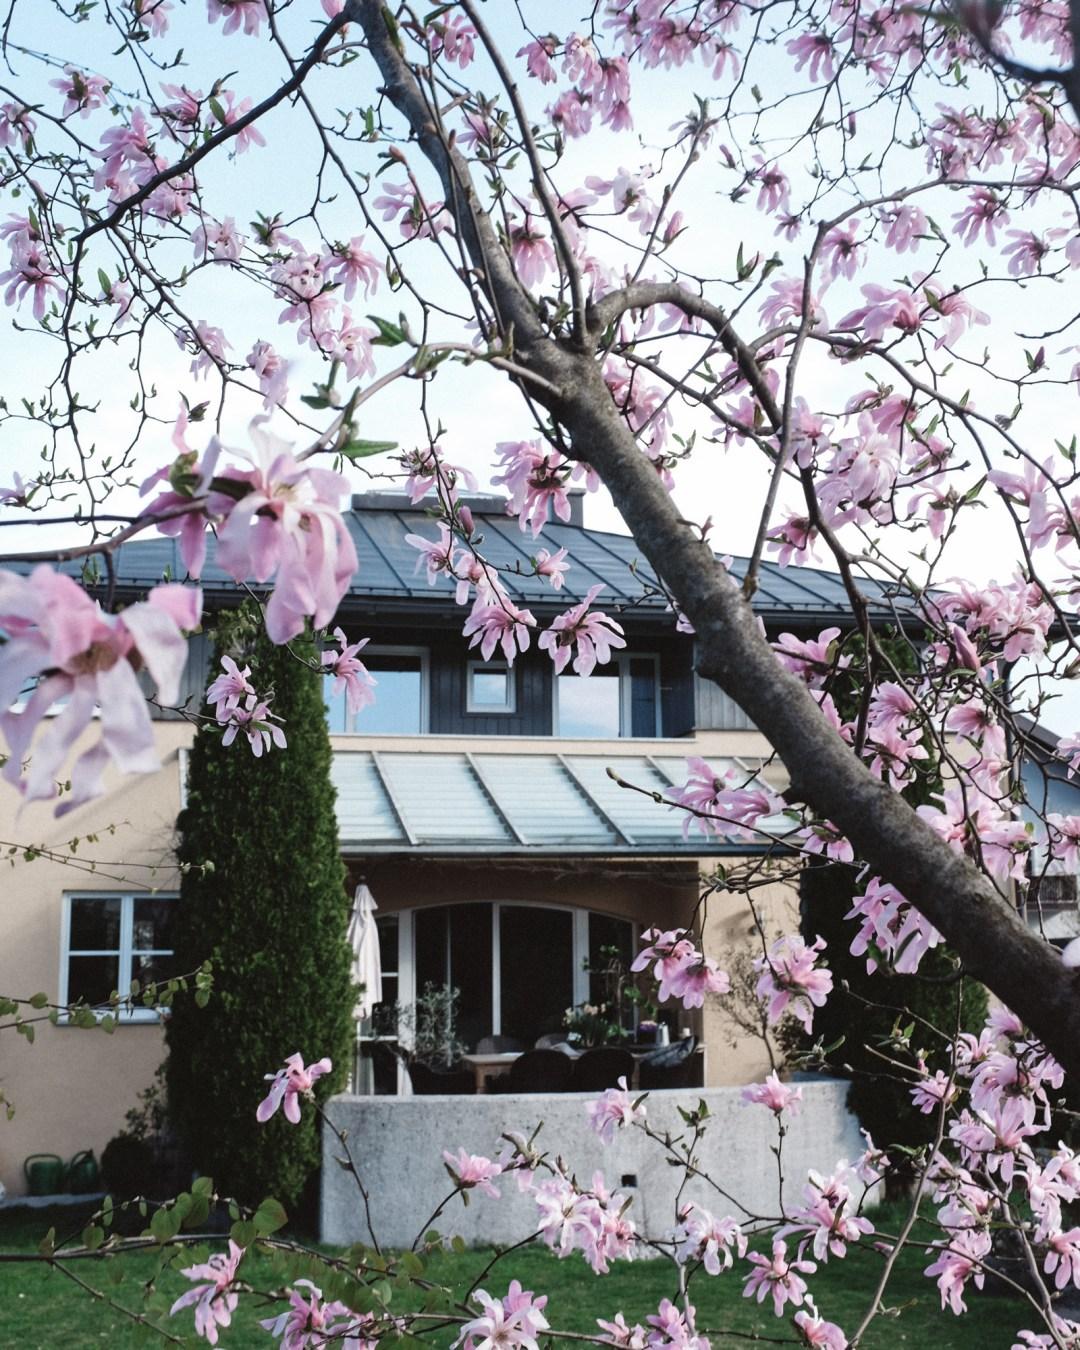 inastil, Frühlingsgarten, Teich, Magnolien, Frühlingsblüher, Lachs, Spargelrezept, Mangosalsa, Lowcarb, leichtes Abendessen, Ü50Blogger-5